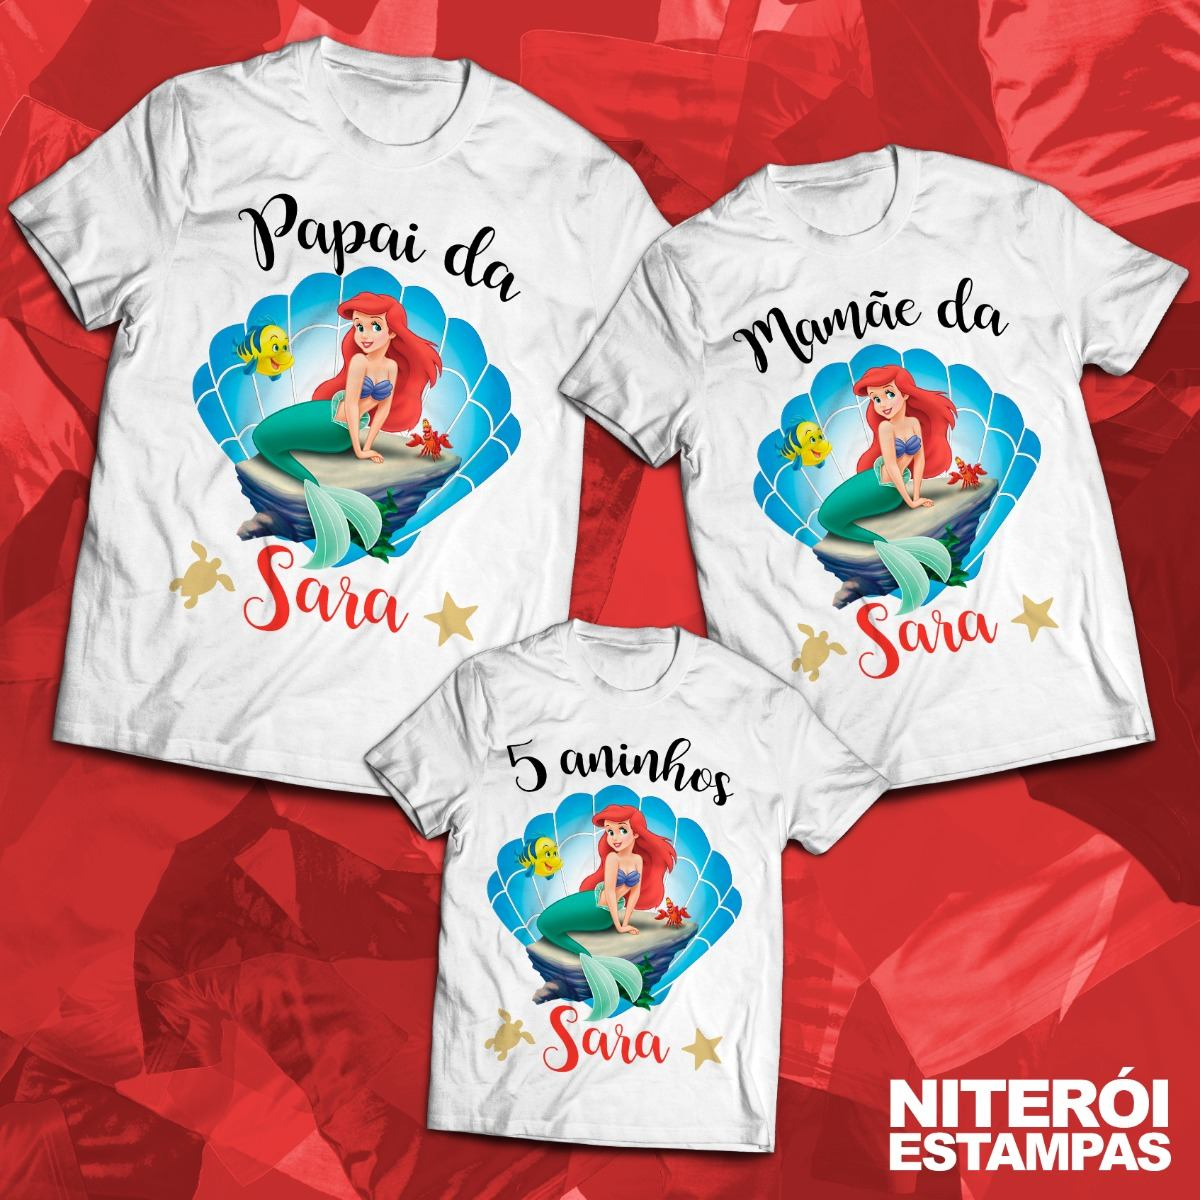 f74bf927f Kit Festa Pequena Sereia - 3 Blusas Personalizadas - R  63